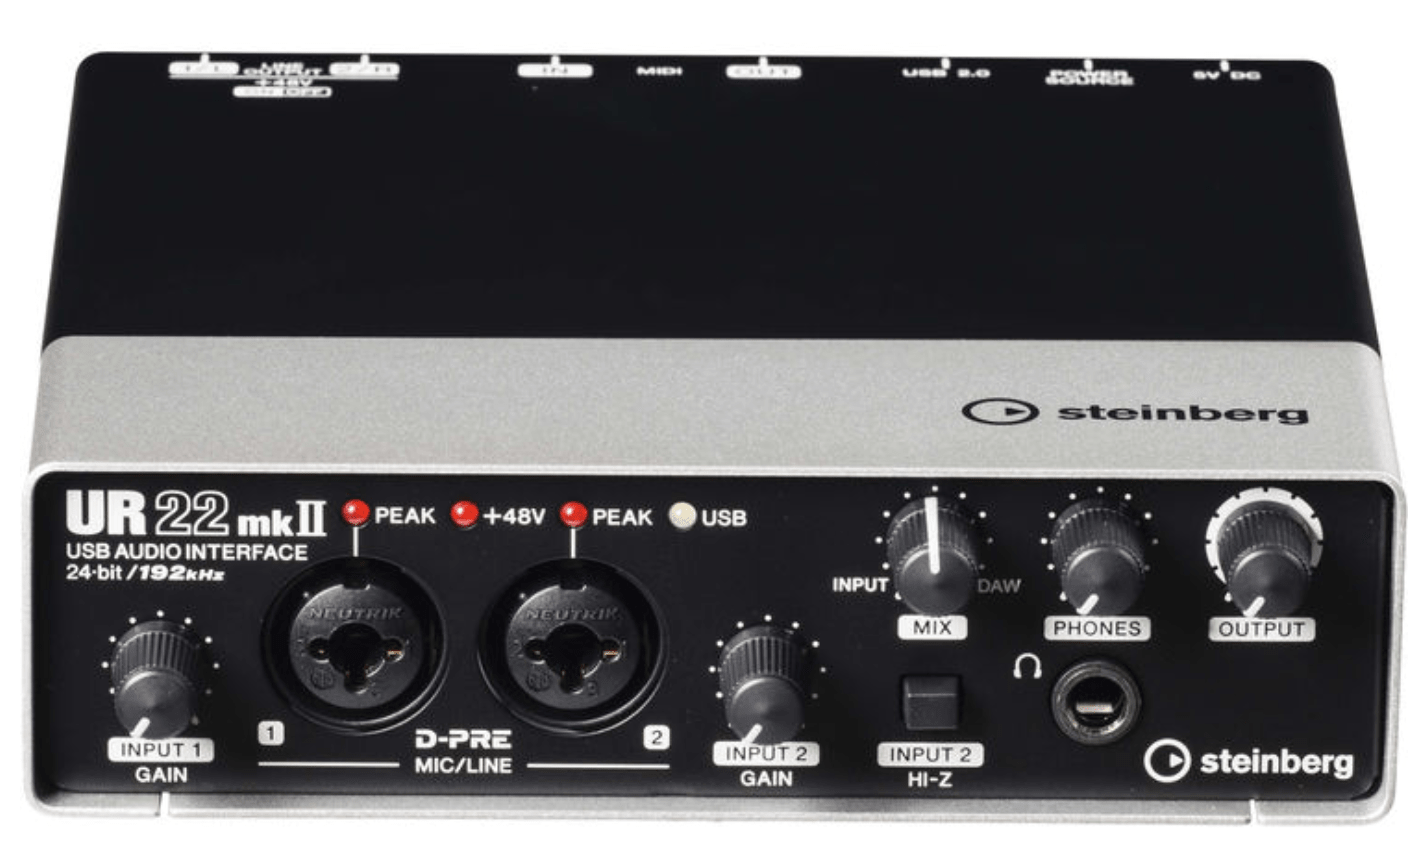 cymatics-best audio interface-steinberg